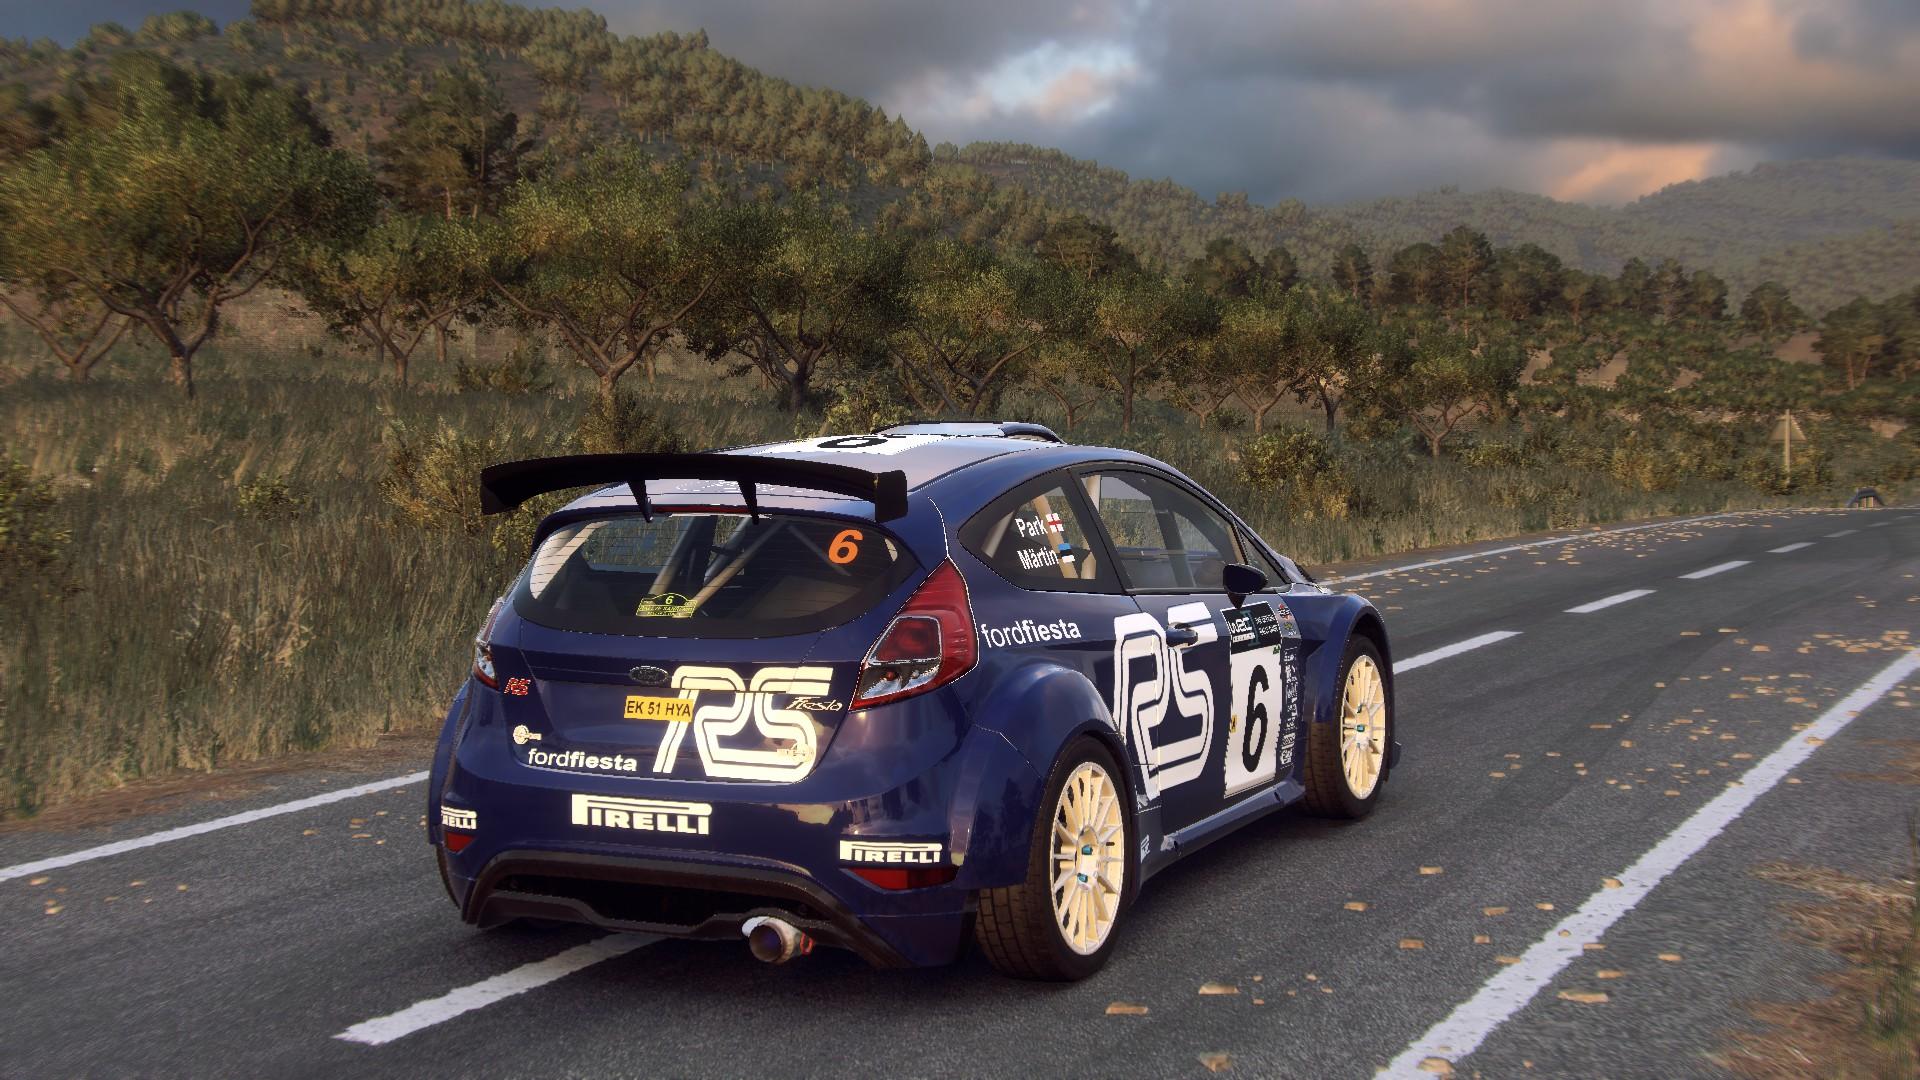 Ford Fiesta R5 (Märtin-Parks - Rallye Sanremo - Rallye d'Italia 2002 - Hommagge) (5).jpg